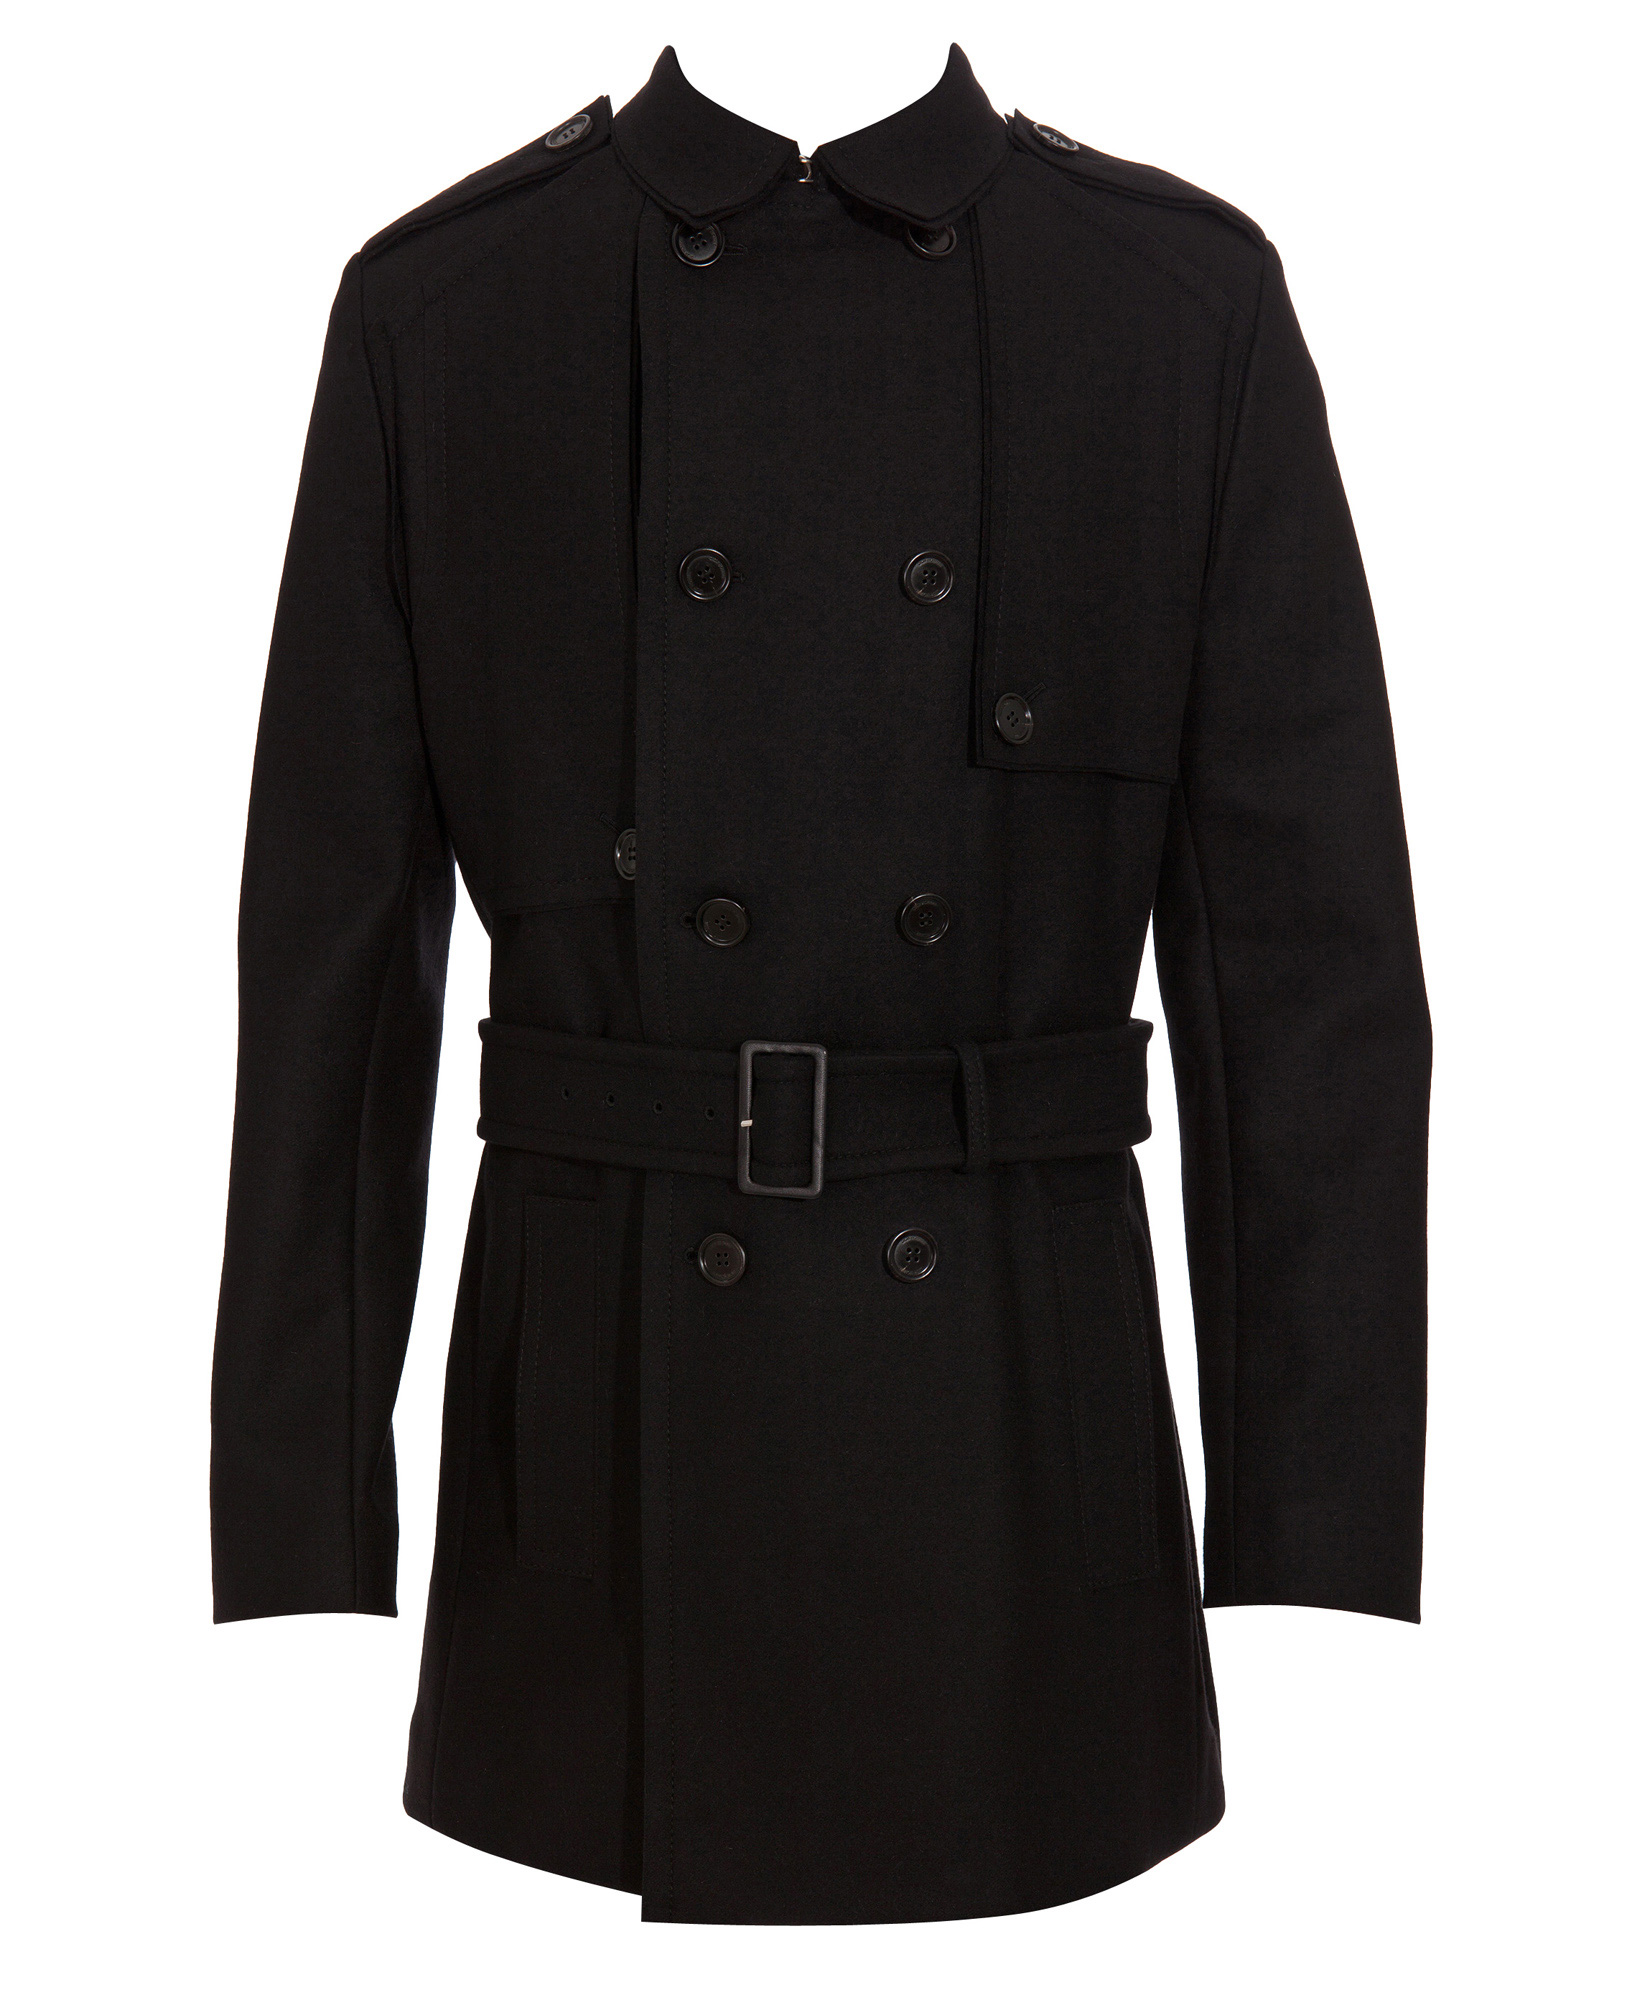 dior homme wool trench coat in black for men lyst. Black Bedroom Furniture Sets. Home Design Ideas